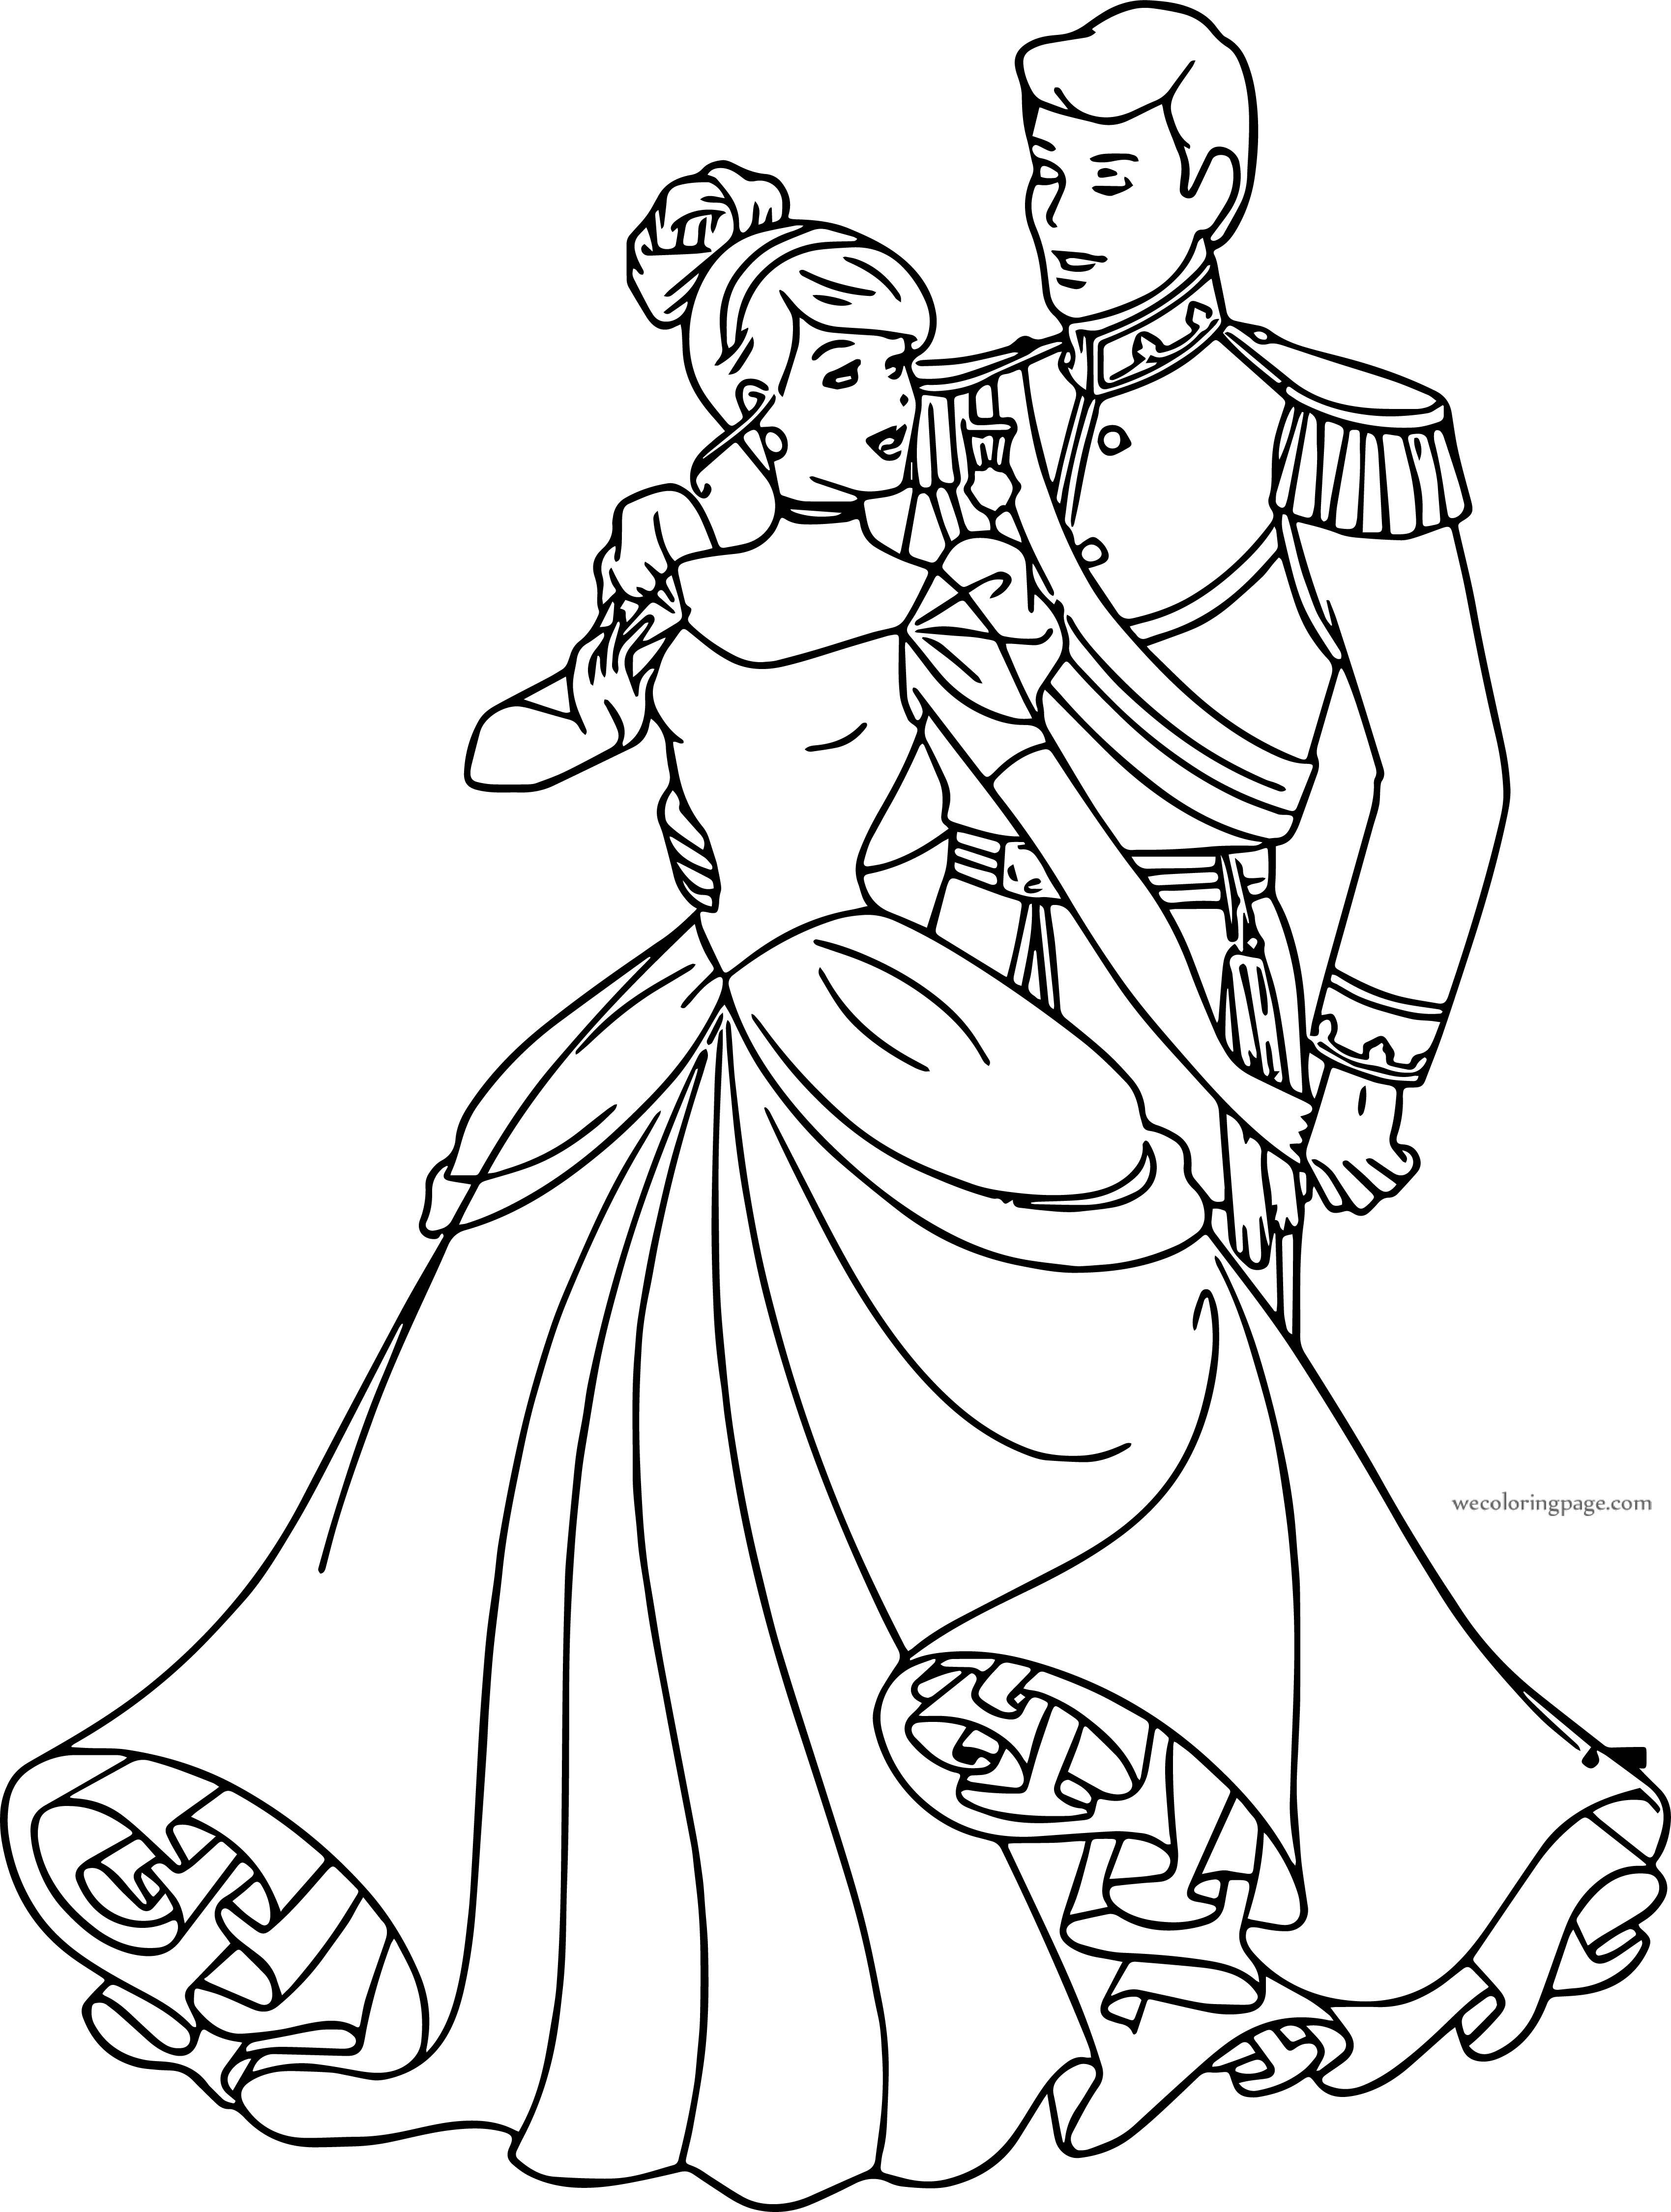 Prince Charming Coloring Sheet